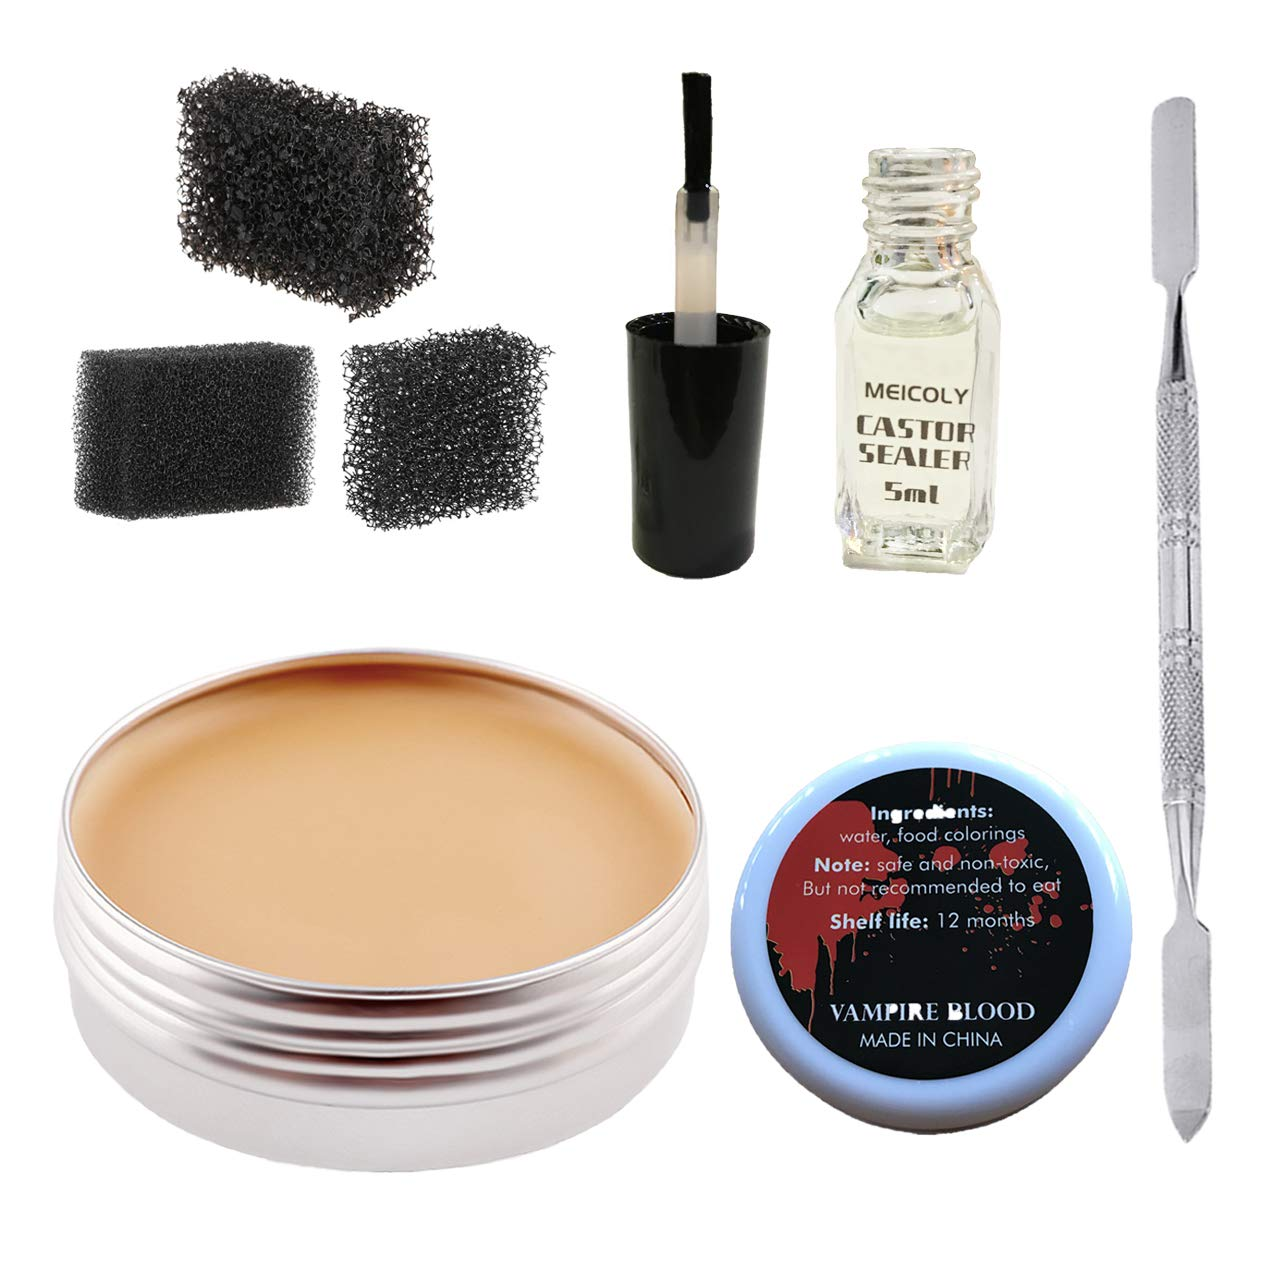 Makeup Skin Wax Special Effects Halloween Set Stage Fake Wound Scar,Moulding Scars Wax with Spatula, Black Stipple Sponge,Coagulated Blood Gel,5ml Castor Sealer,02